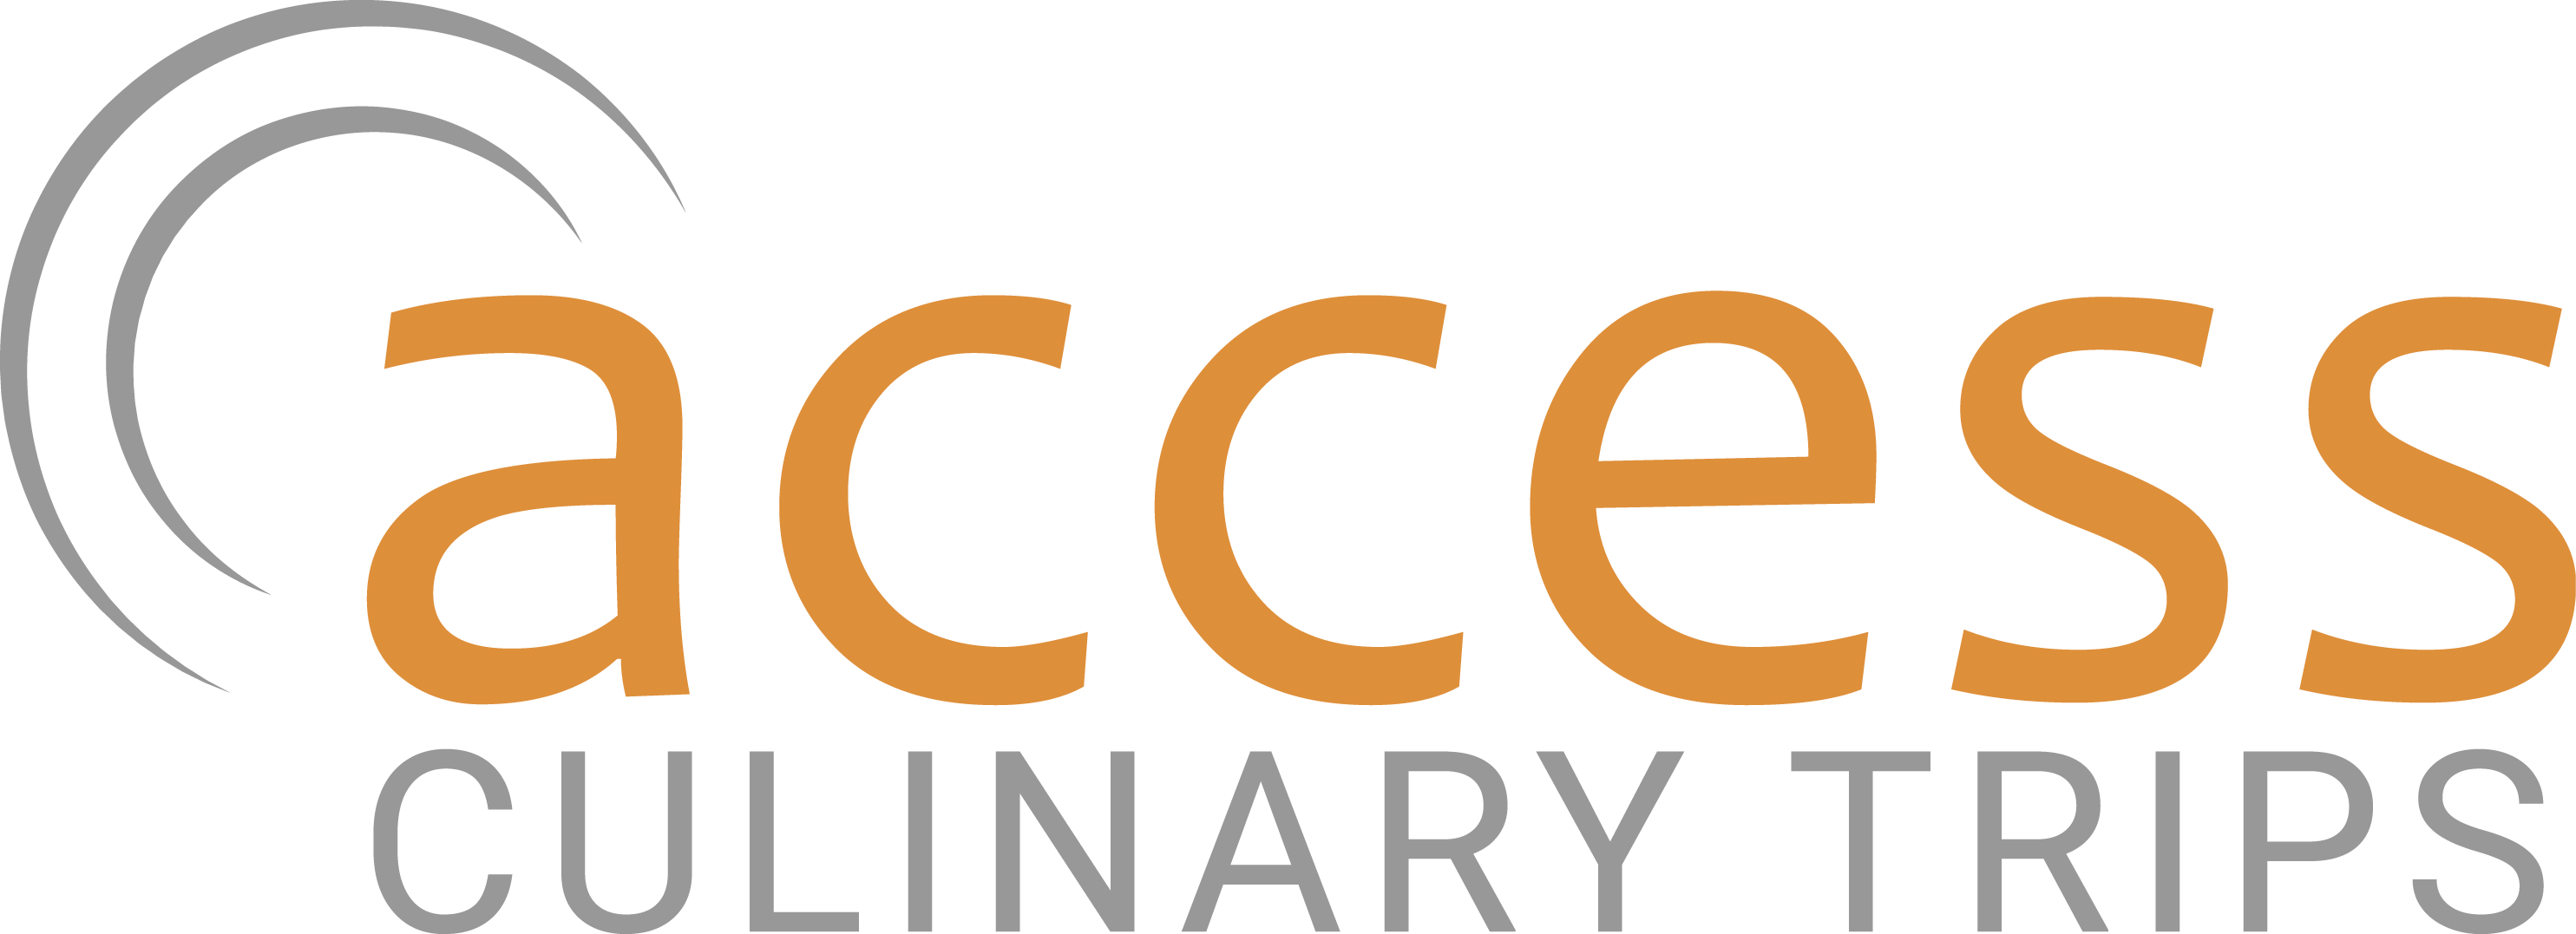 AccessCulinaryTrips_color-logo-1